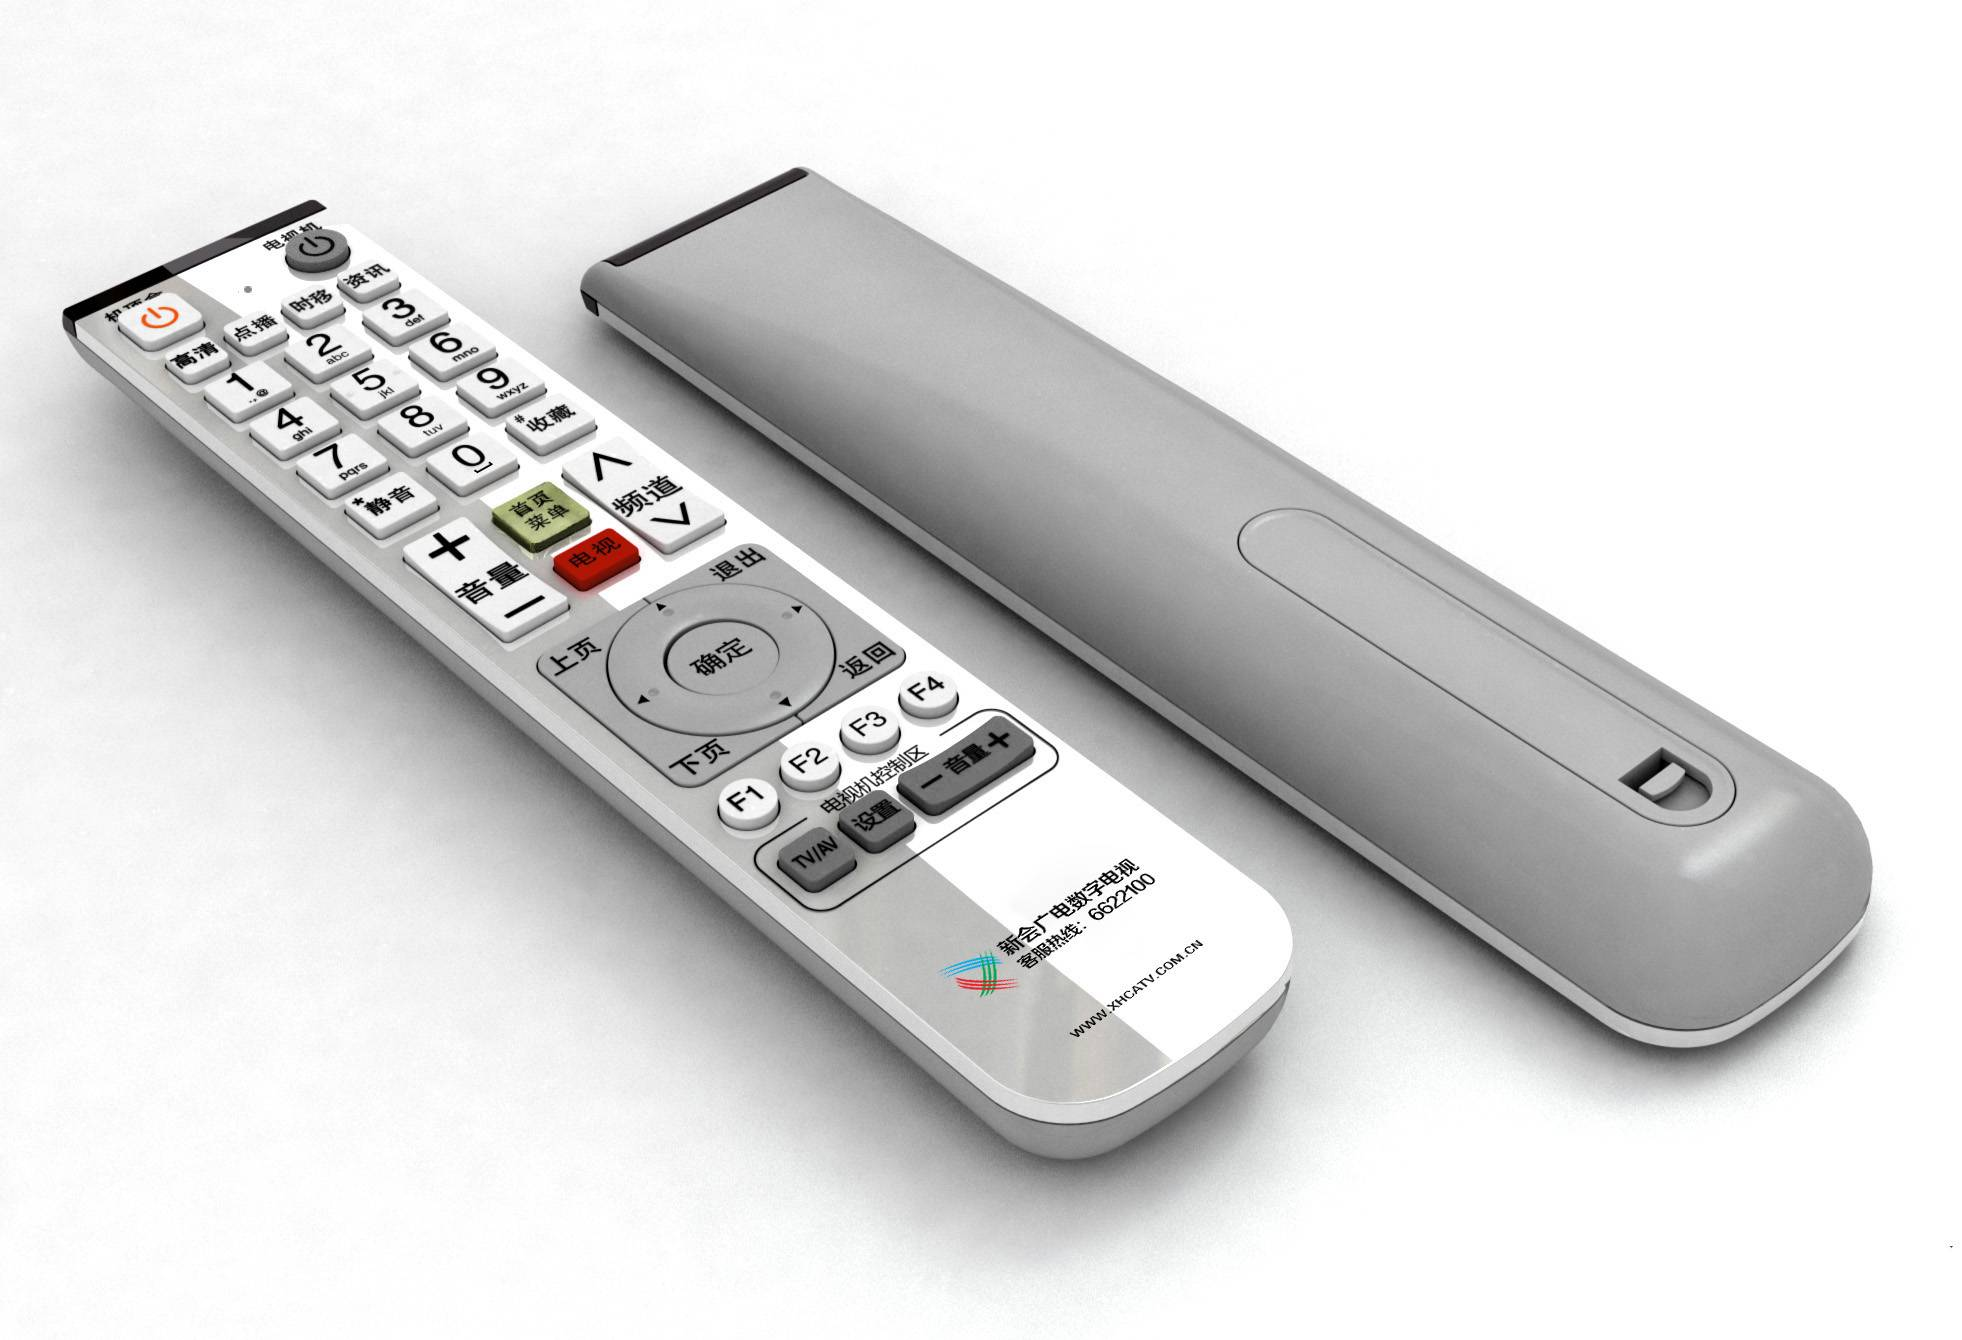 4 in 1 universal remote control